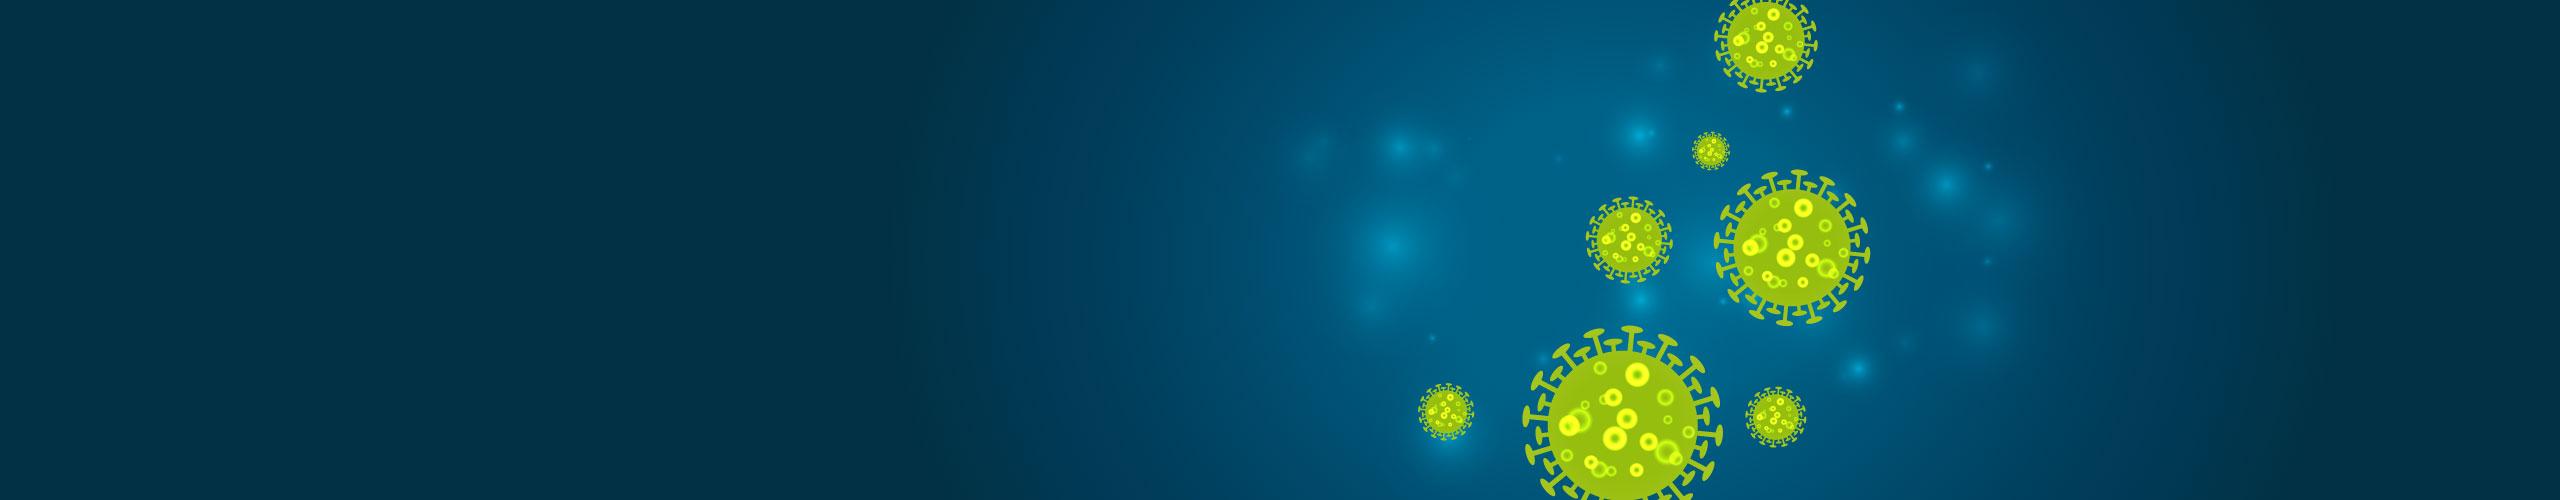 _Lexogen_Products_Coronavirus_Banners